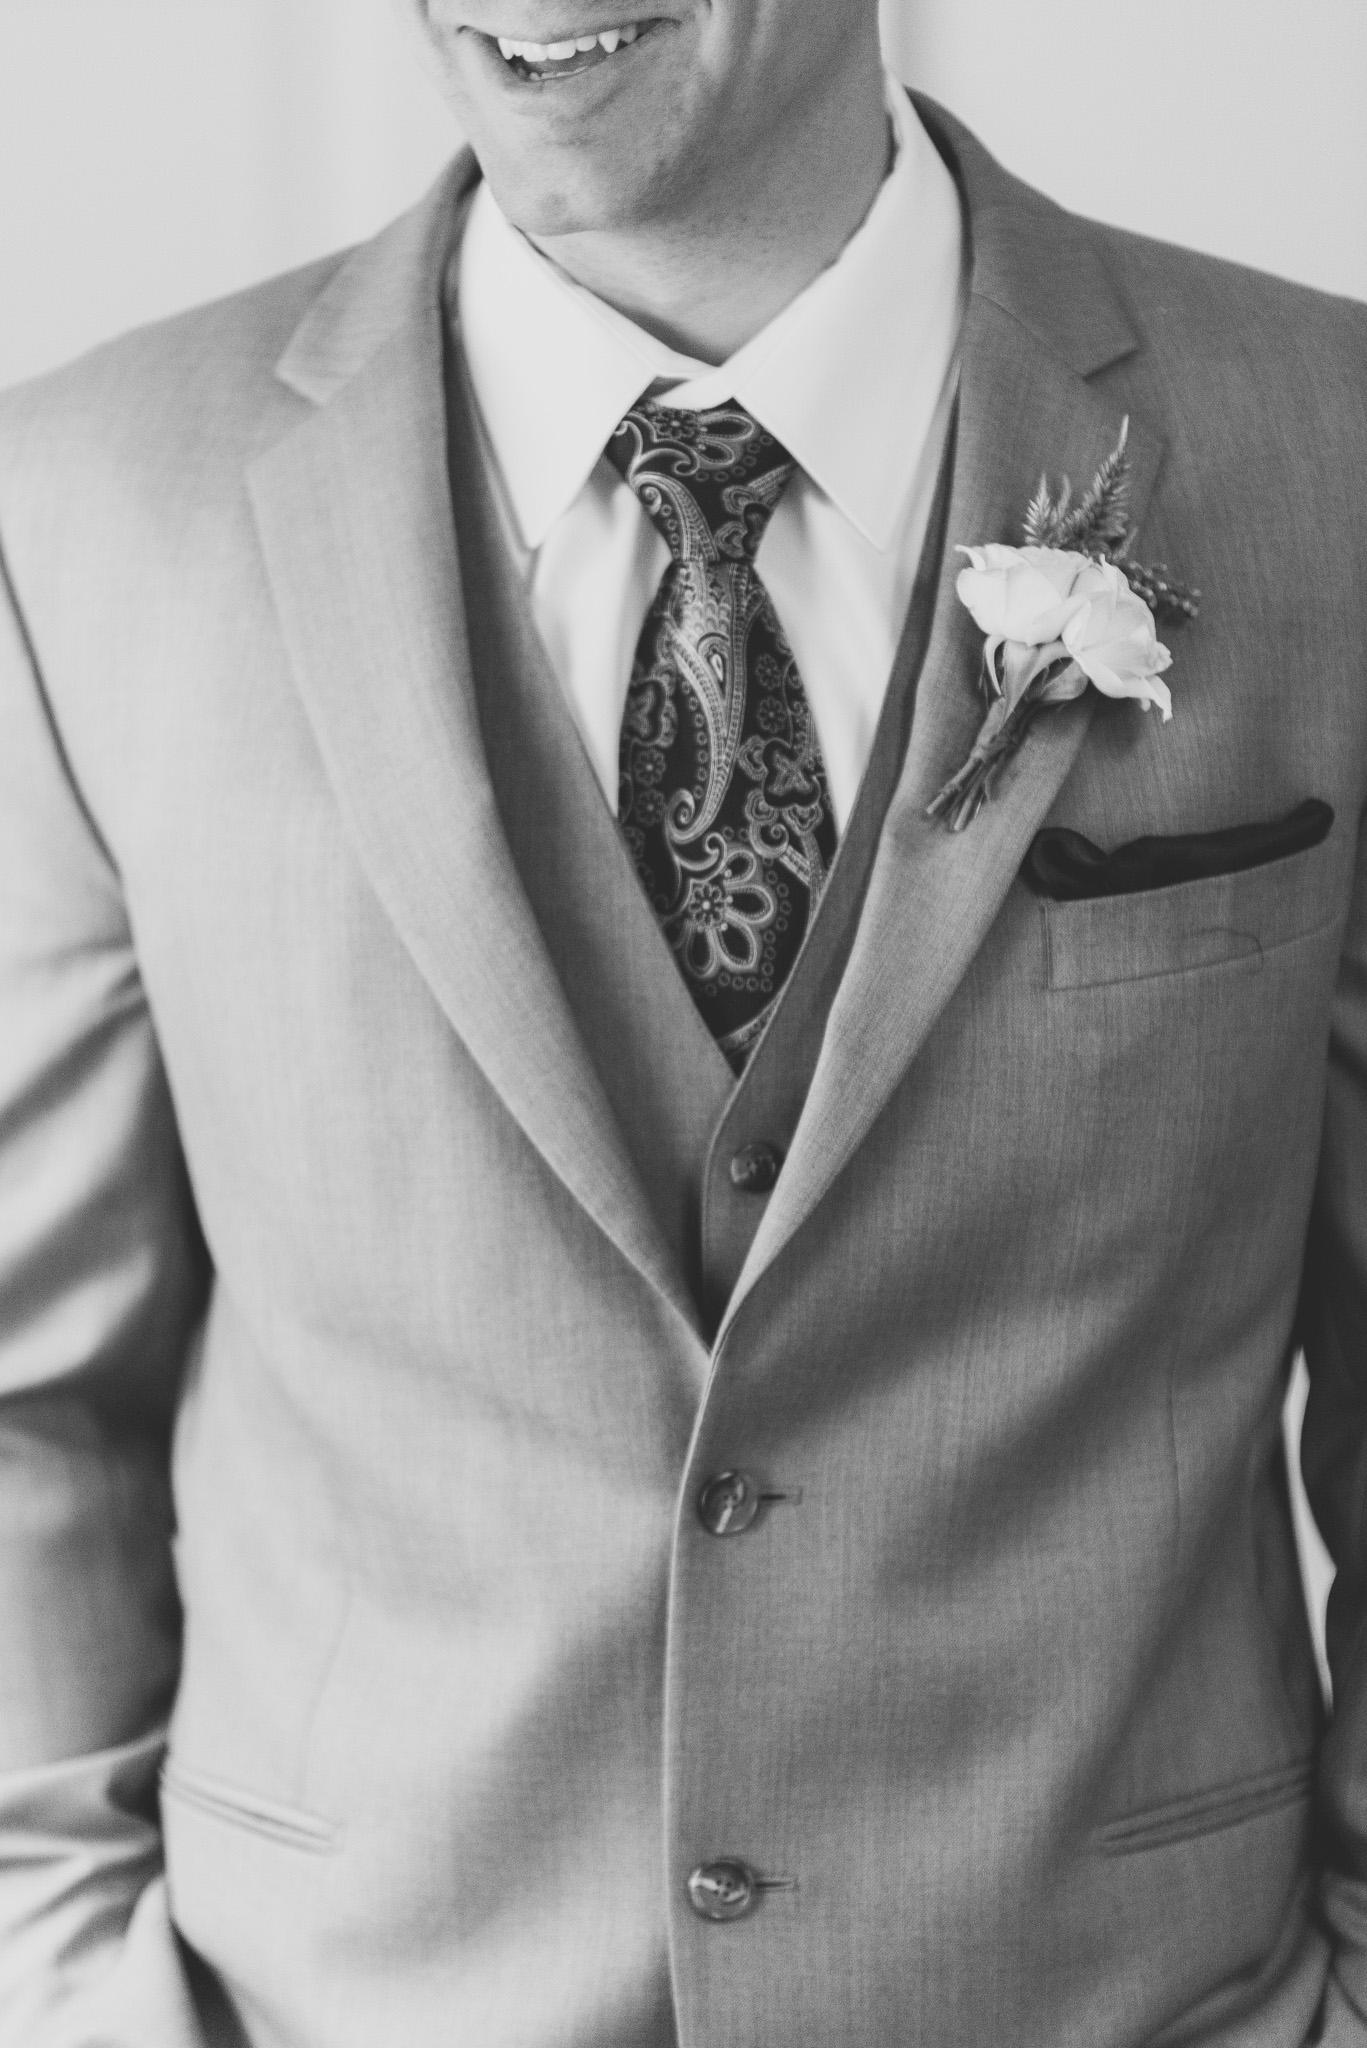 West Manor Wedding_Lynchburg VA_Classic_Black tie_Forest VA_Wedding_photos2024.jpg